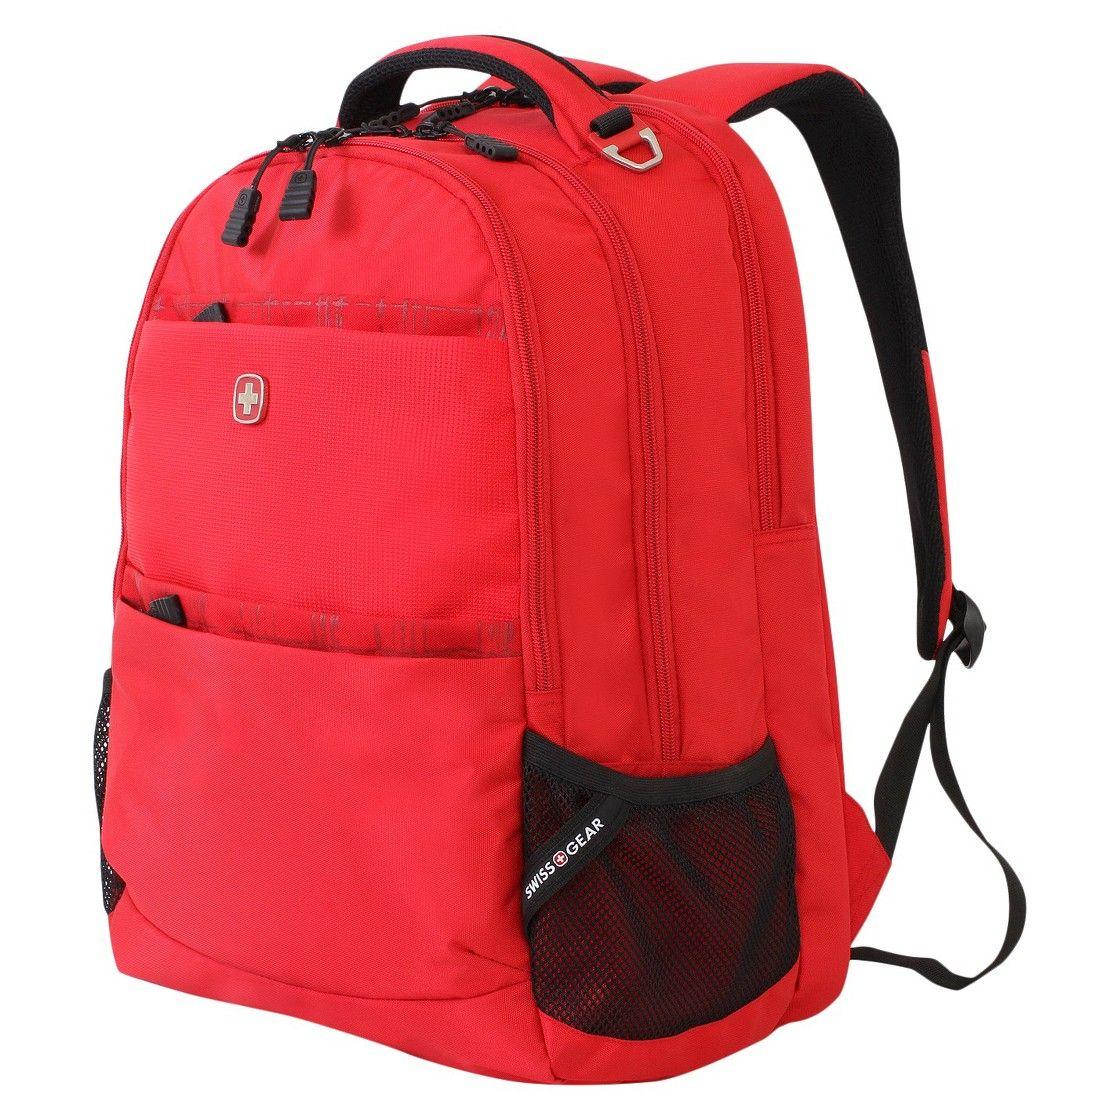 SwissGear Backpack - Solid Red | Laptop Backpack | Pinterest ...